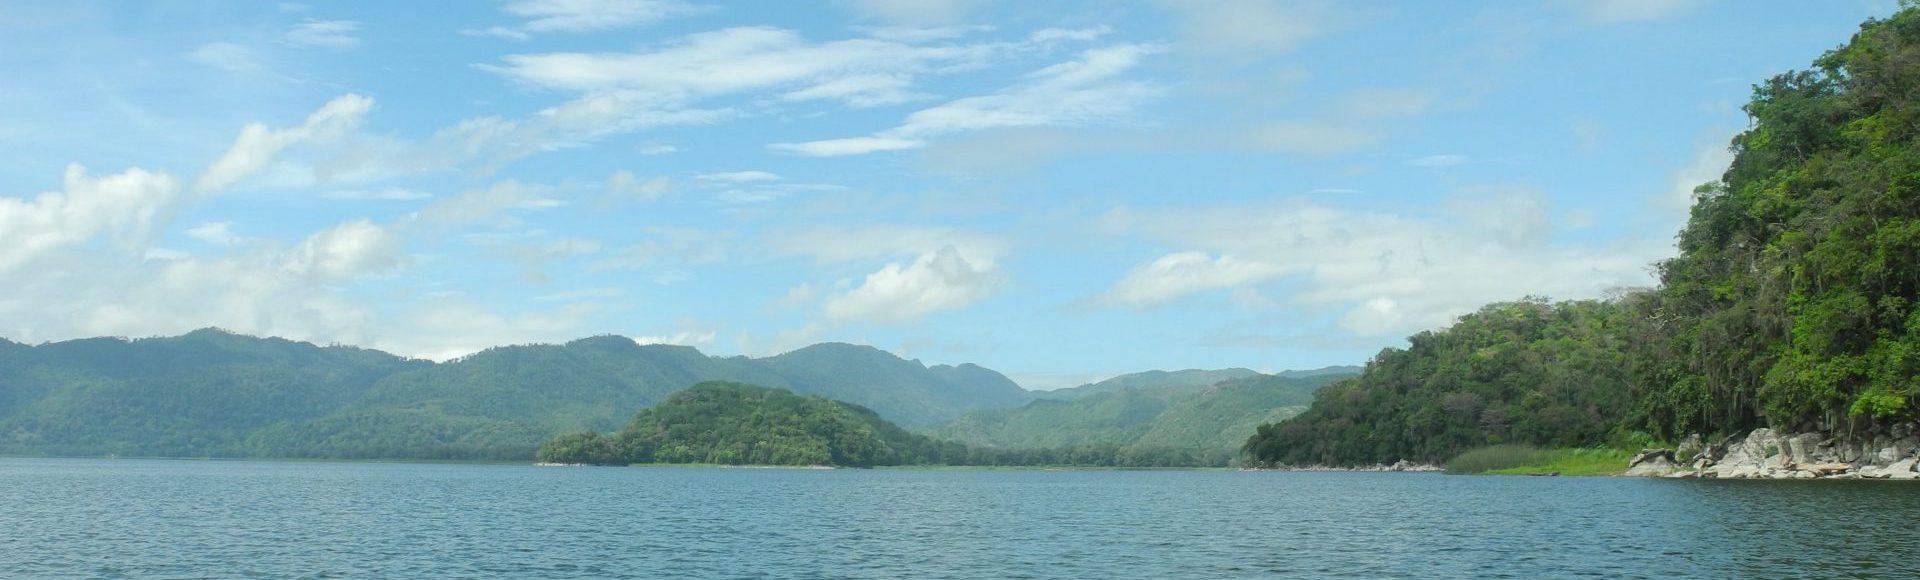 Mise au vert au Lago de Yojoa